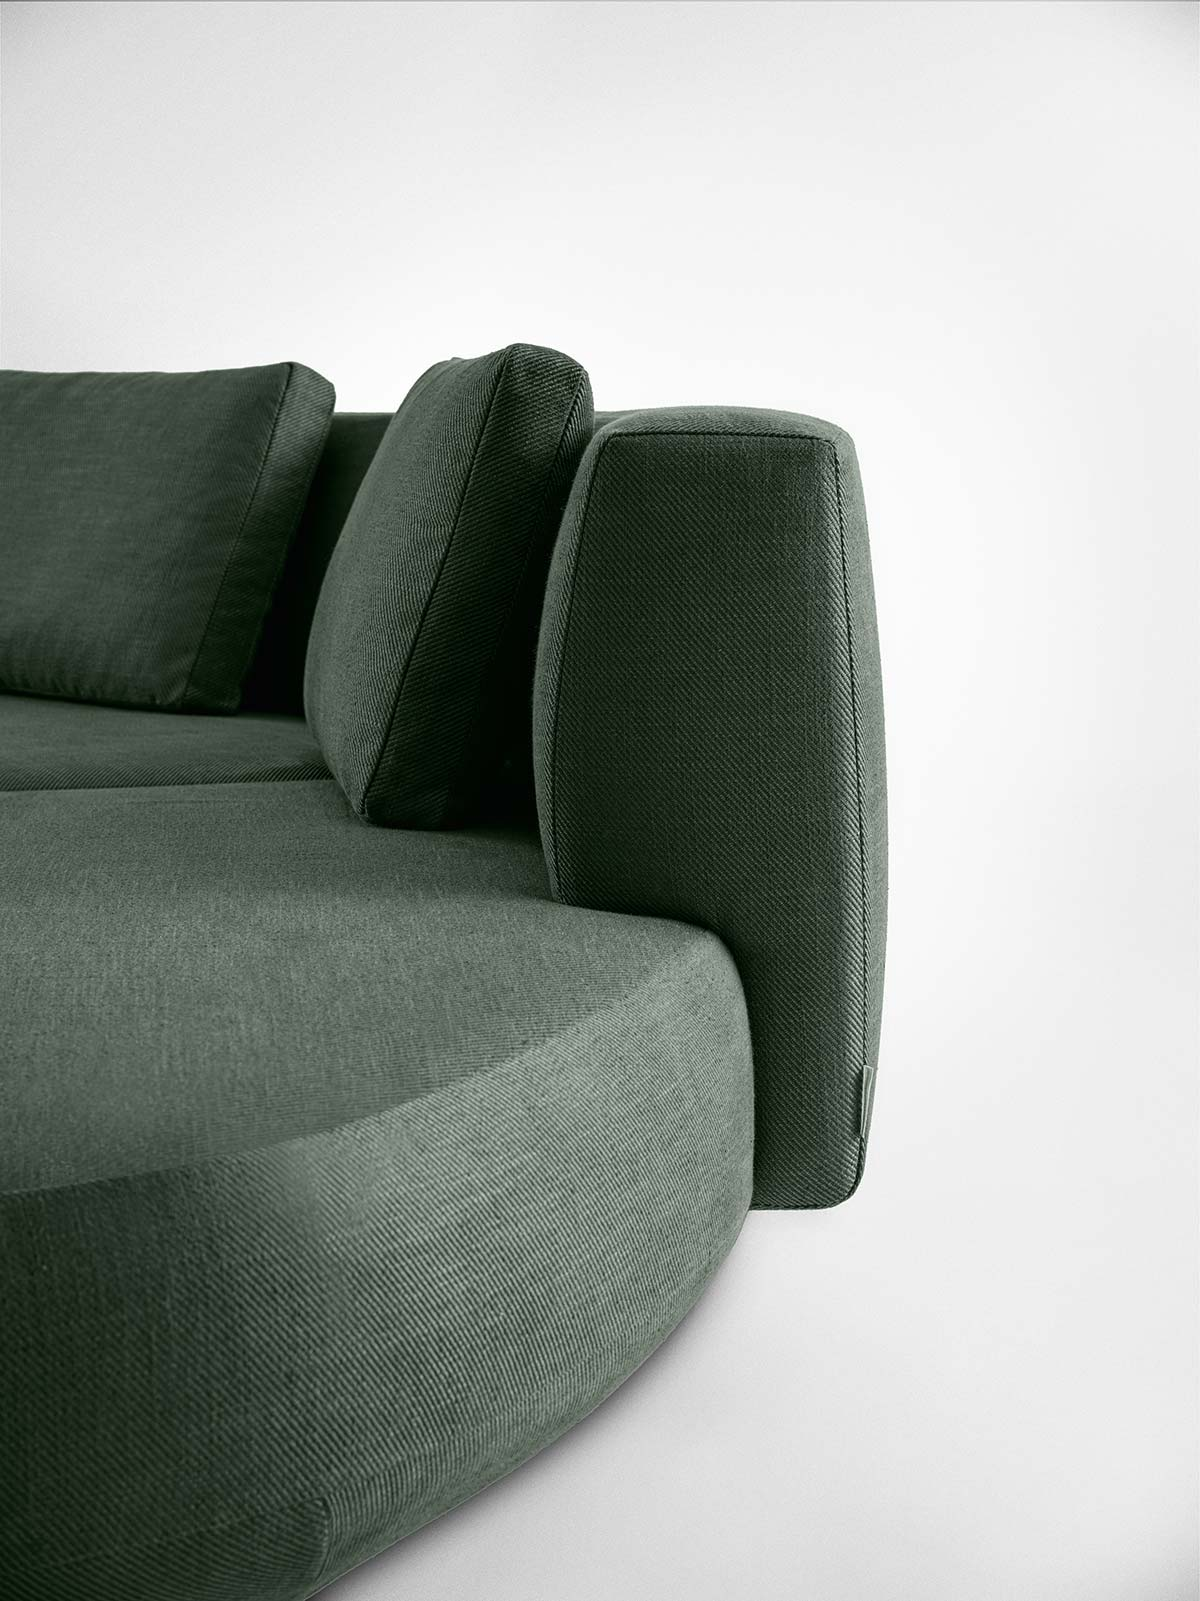 Audrey Motion by Gallotti&Radice, Design Massimo Castagna